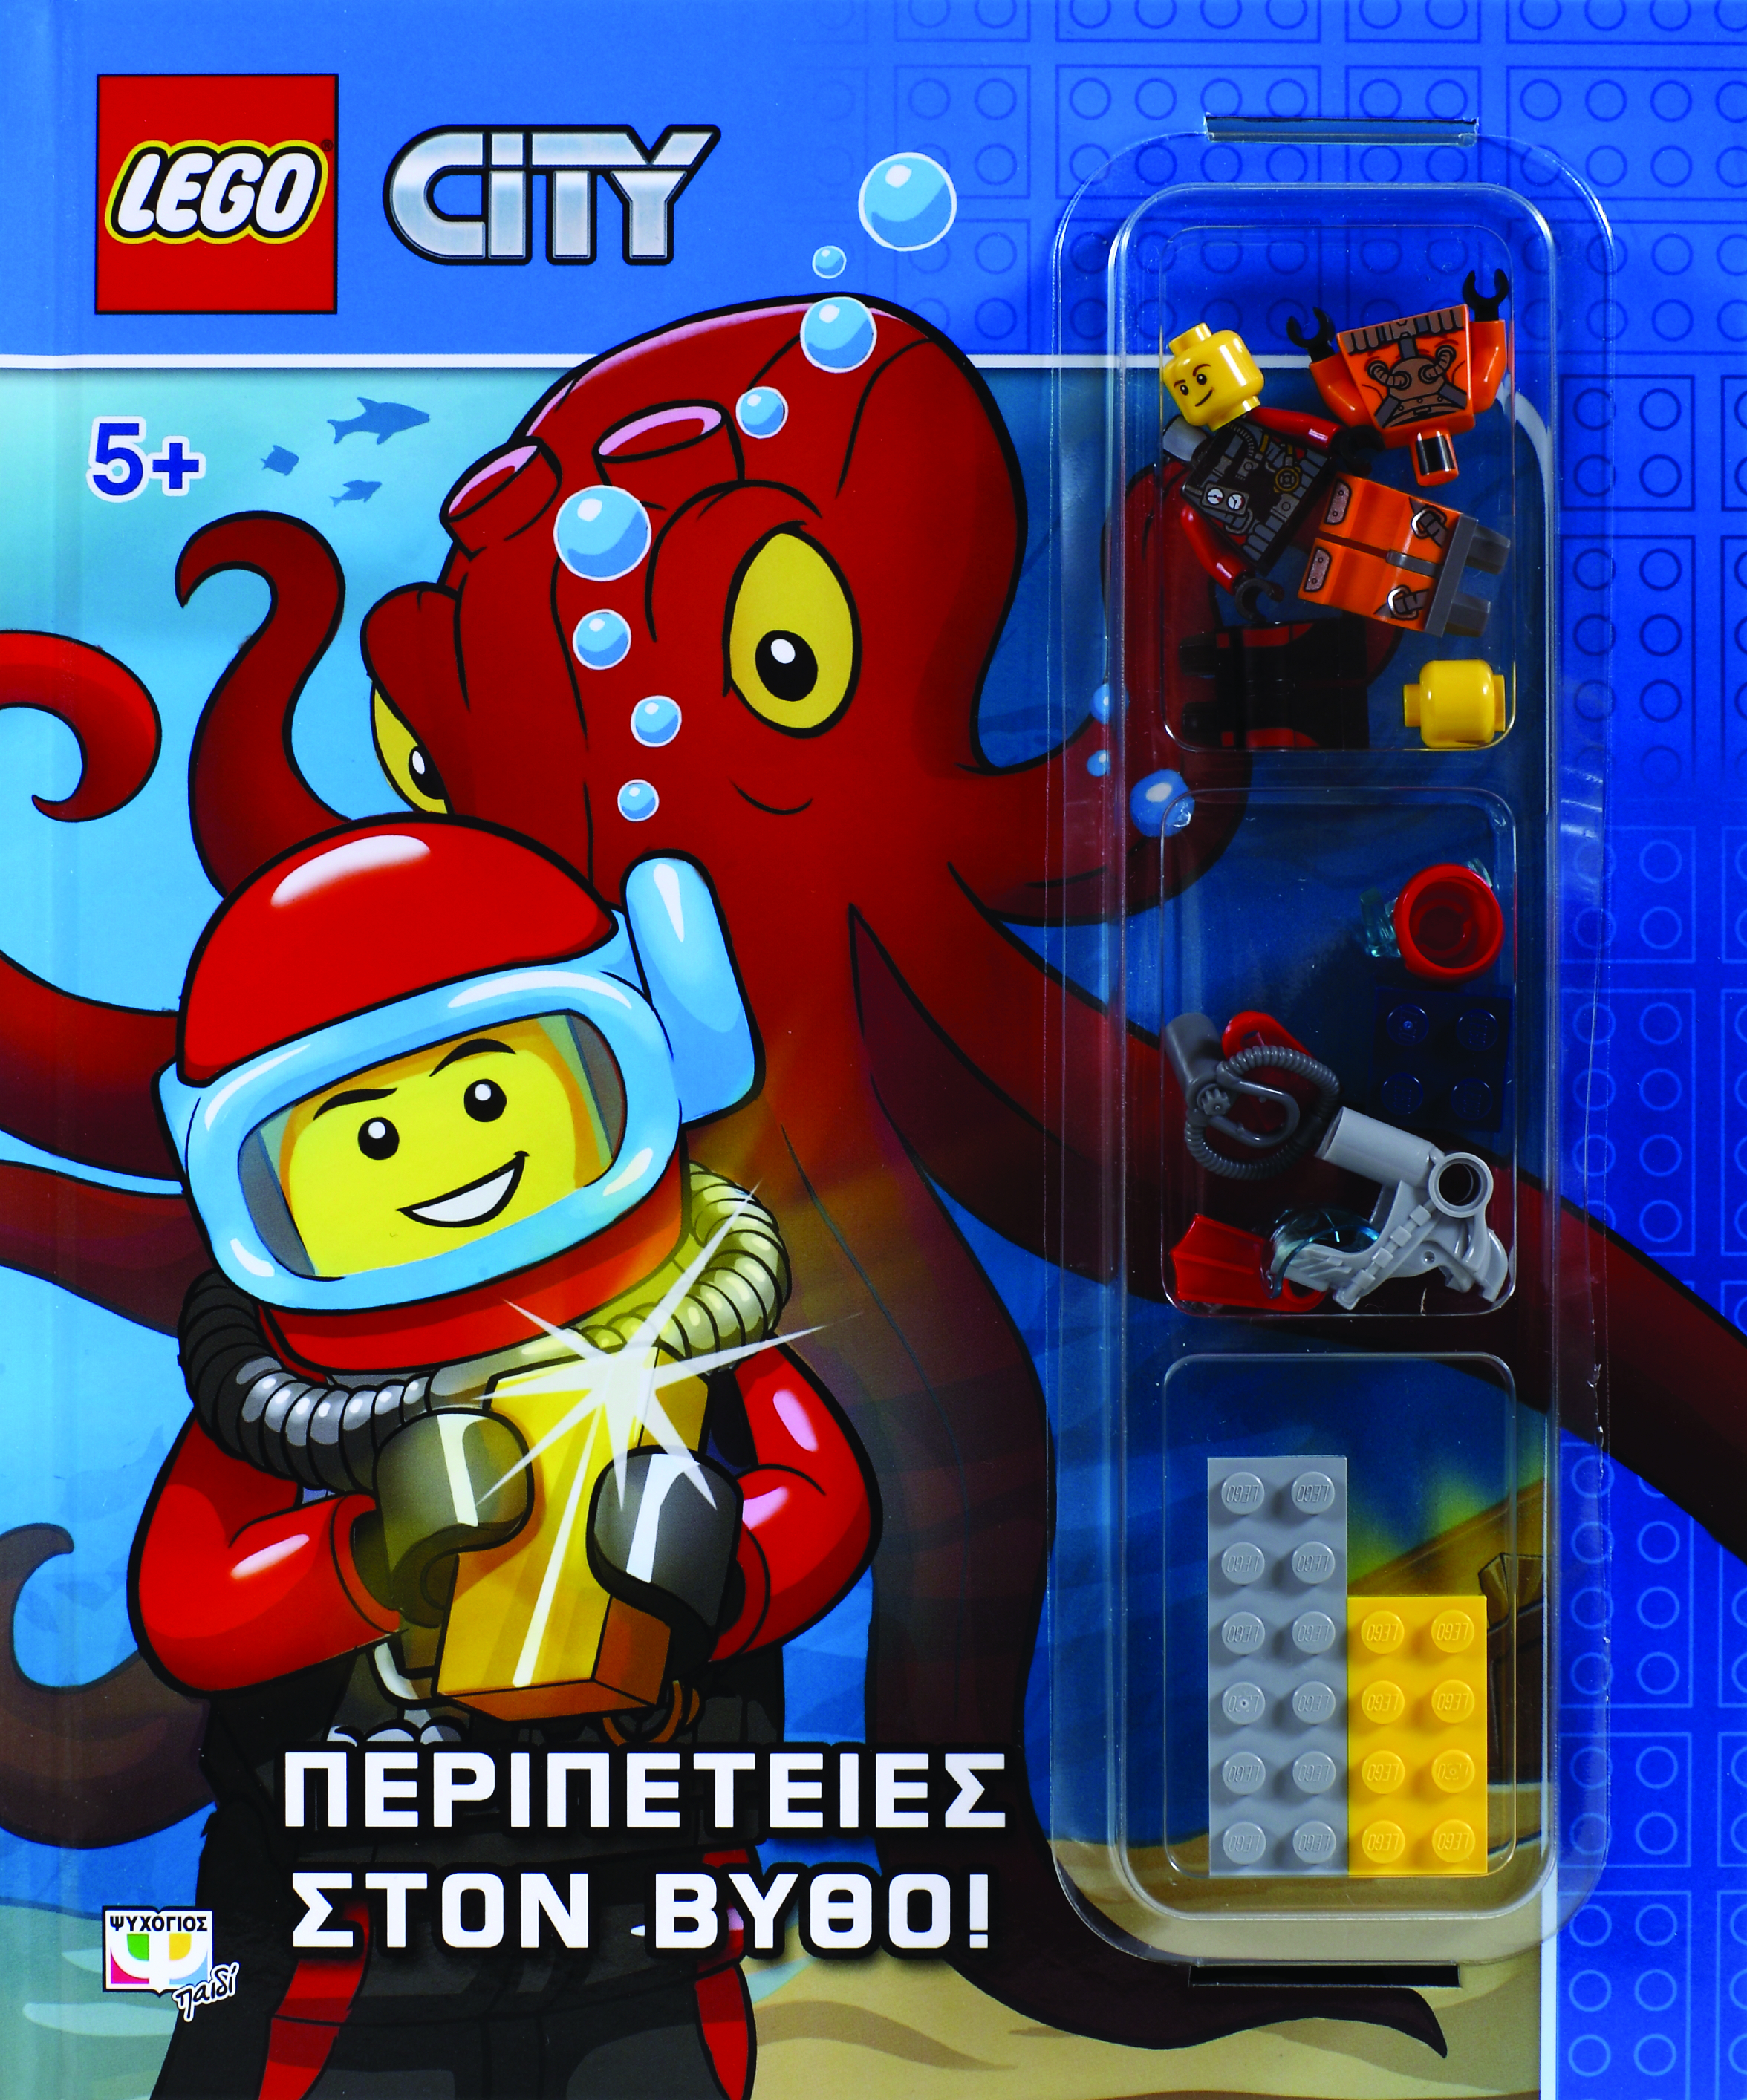 Lego City Περιπέτειες Στον Βυθό bibliopoleio biblia paidika